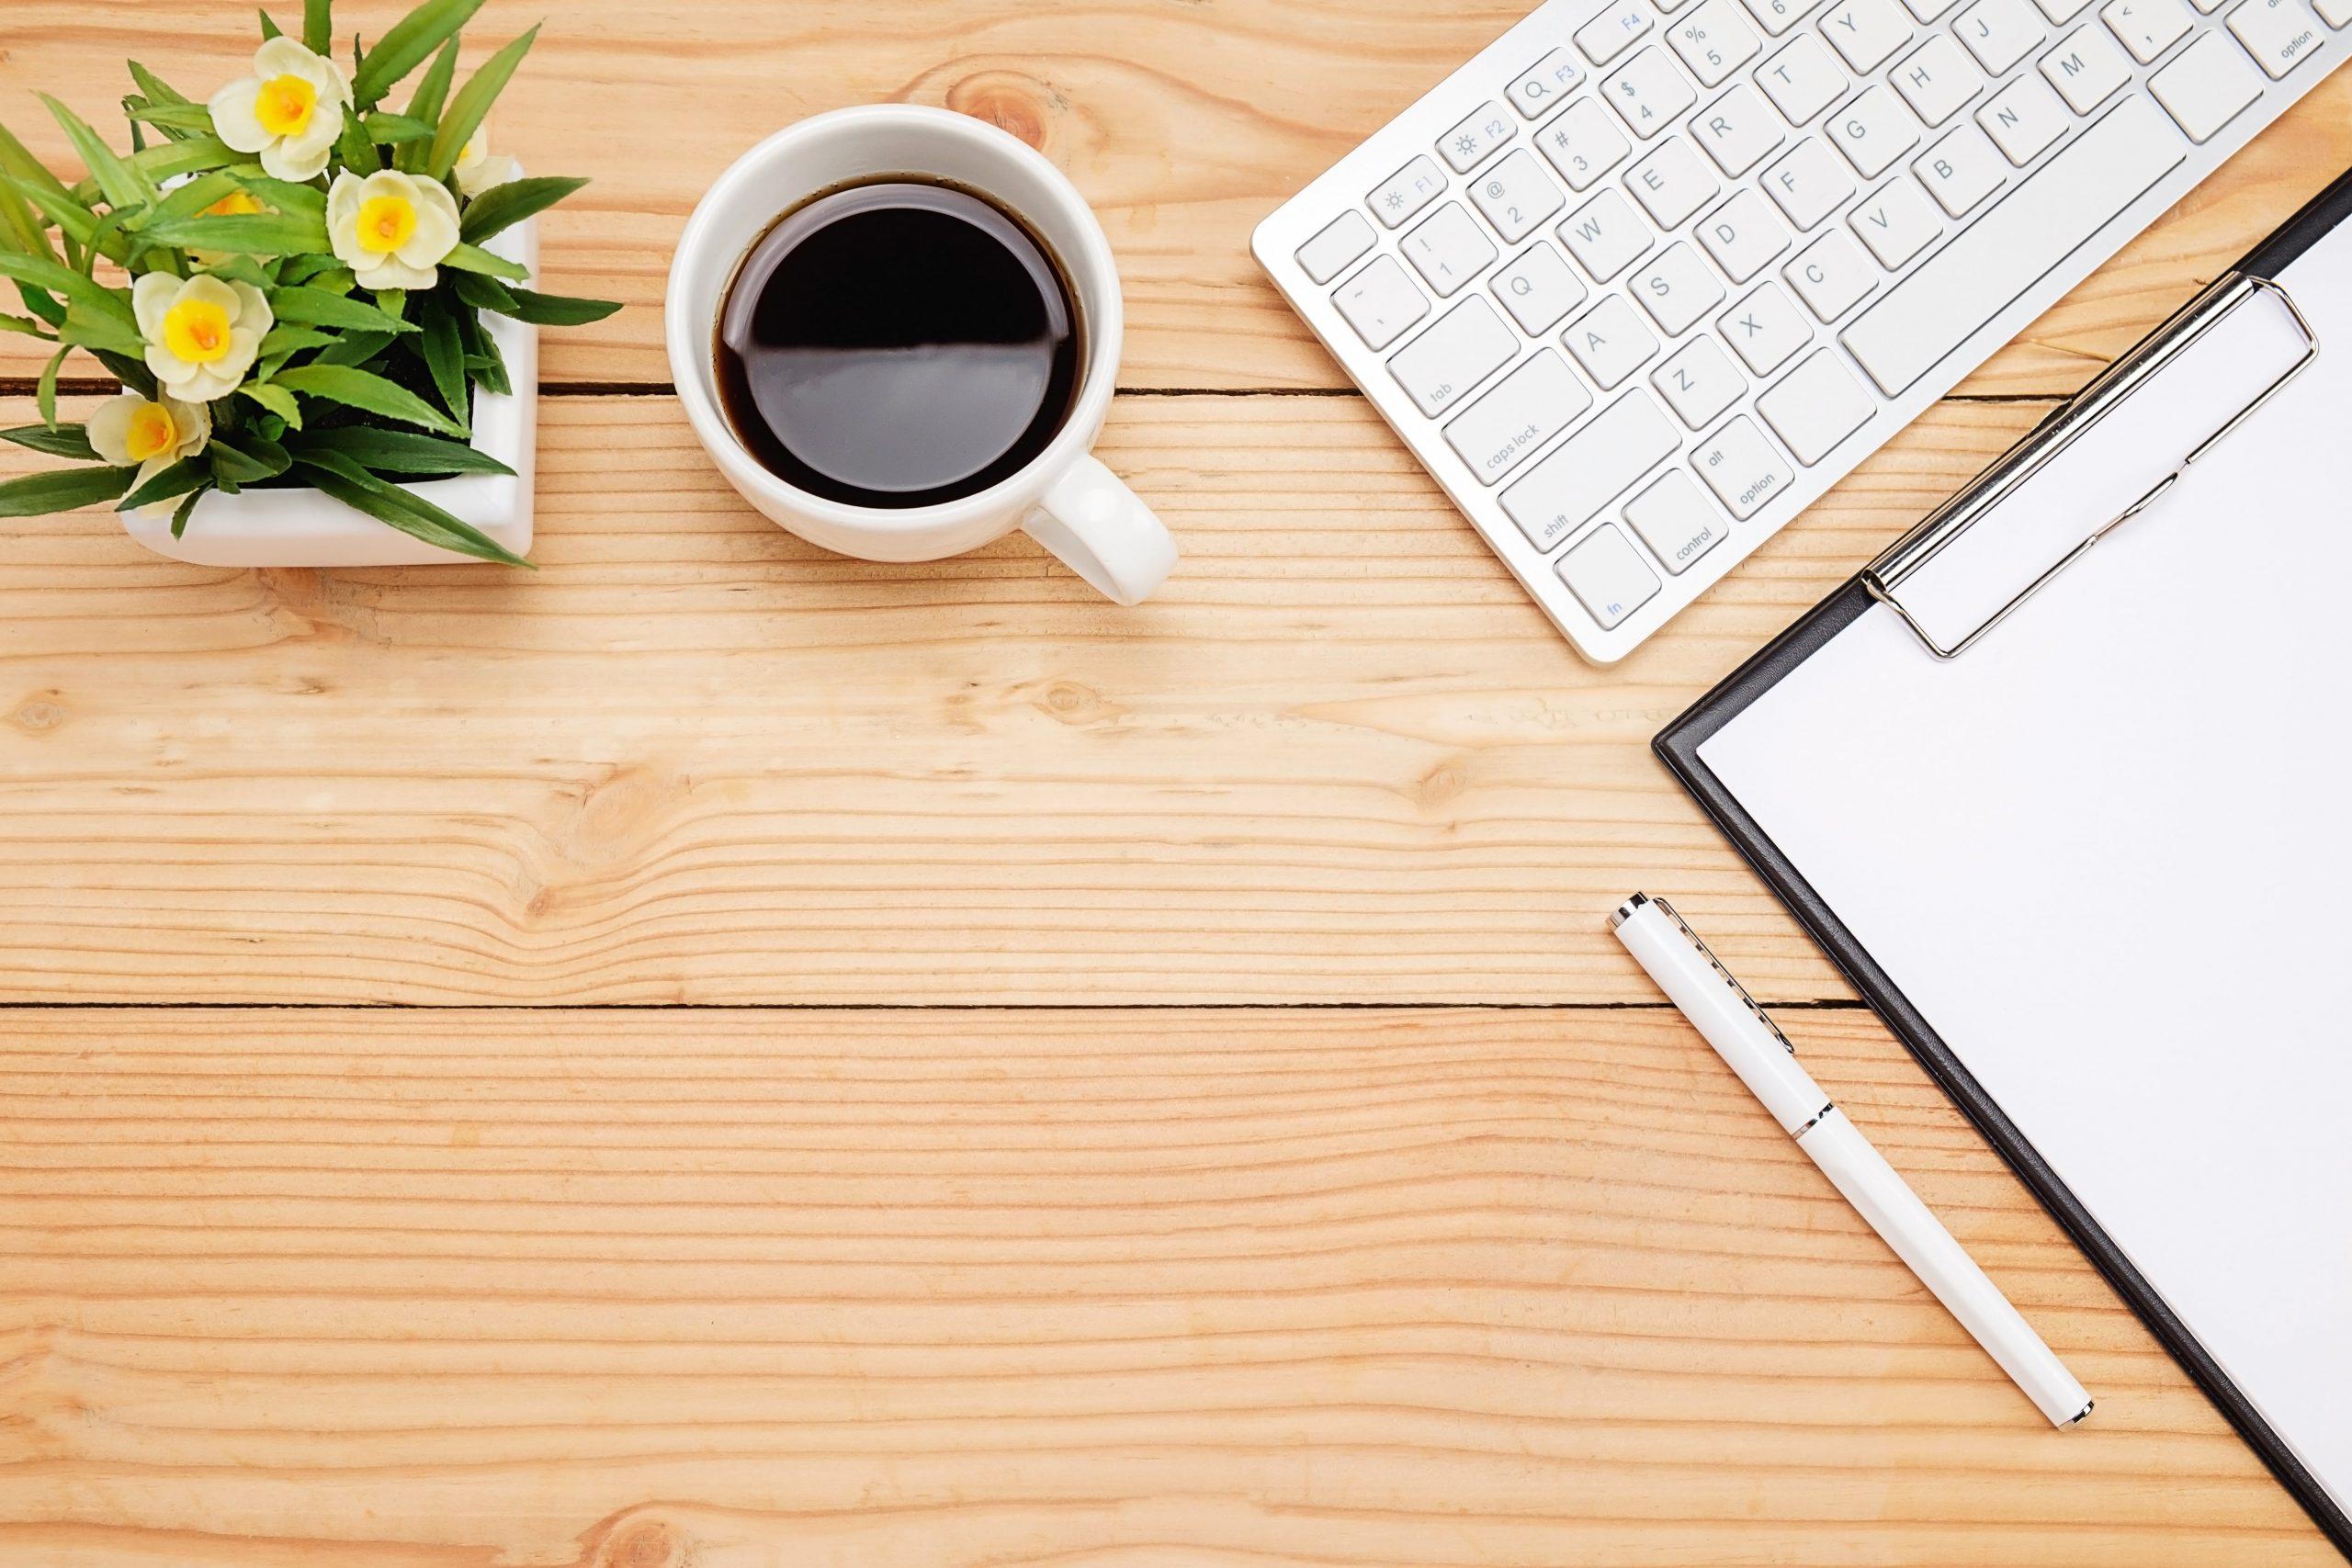 7 Tips to Simplify Digital Estate Planning